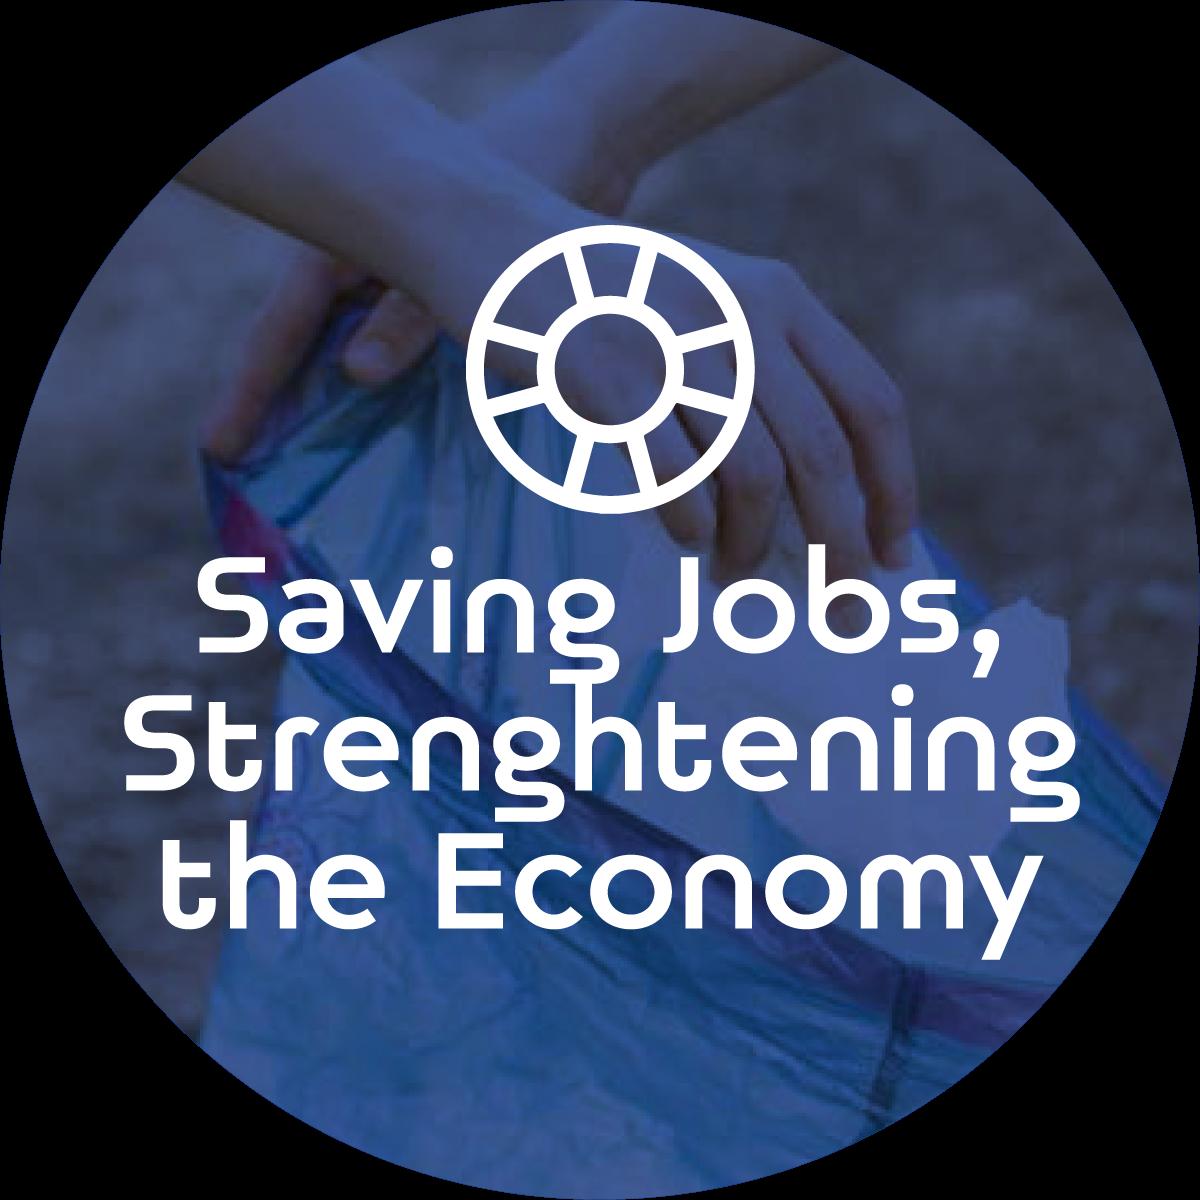 Saving Jobs, Strenghtening the Economy